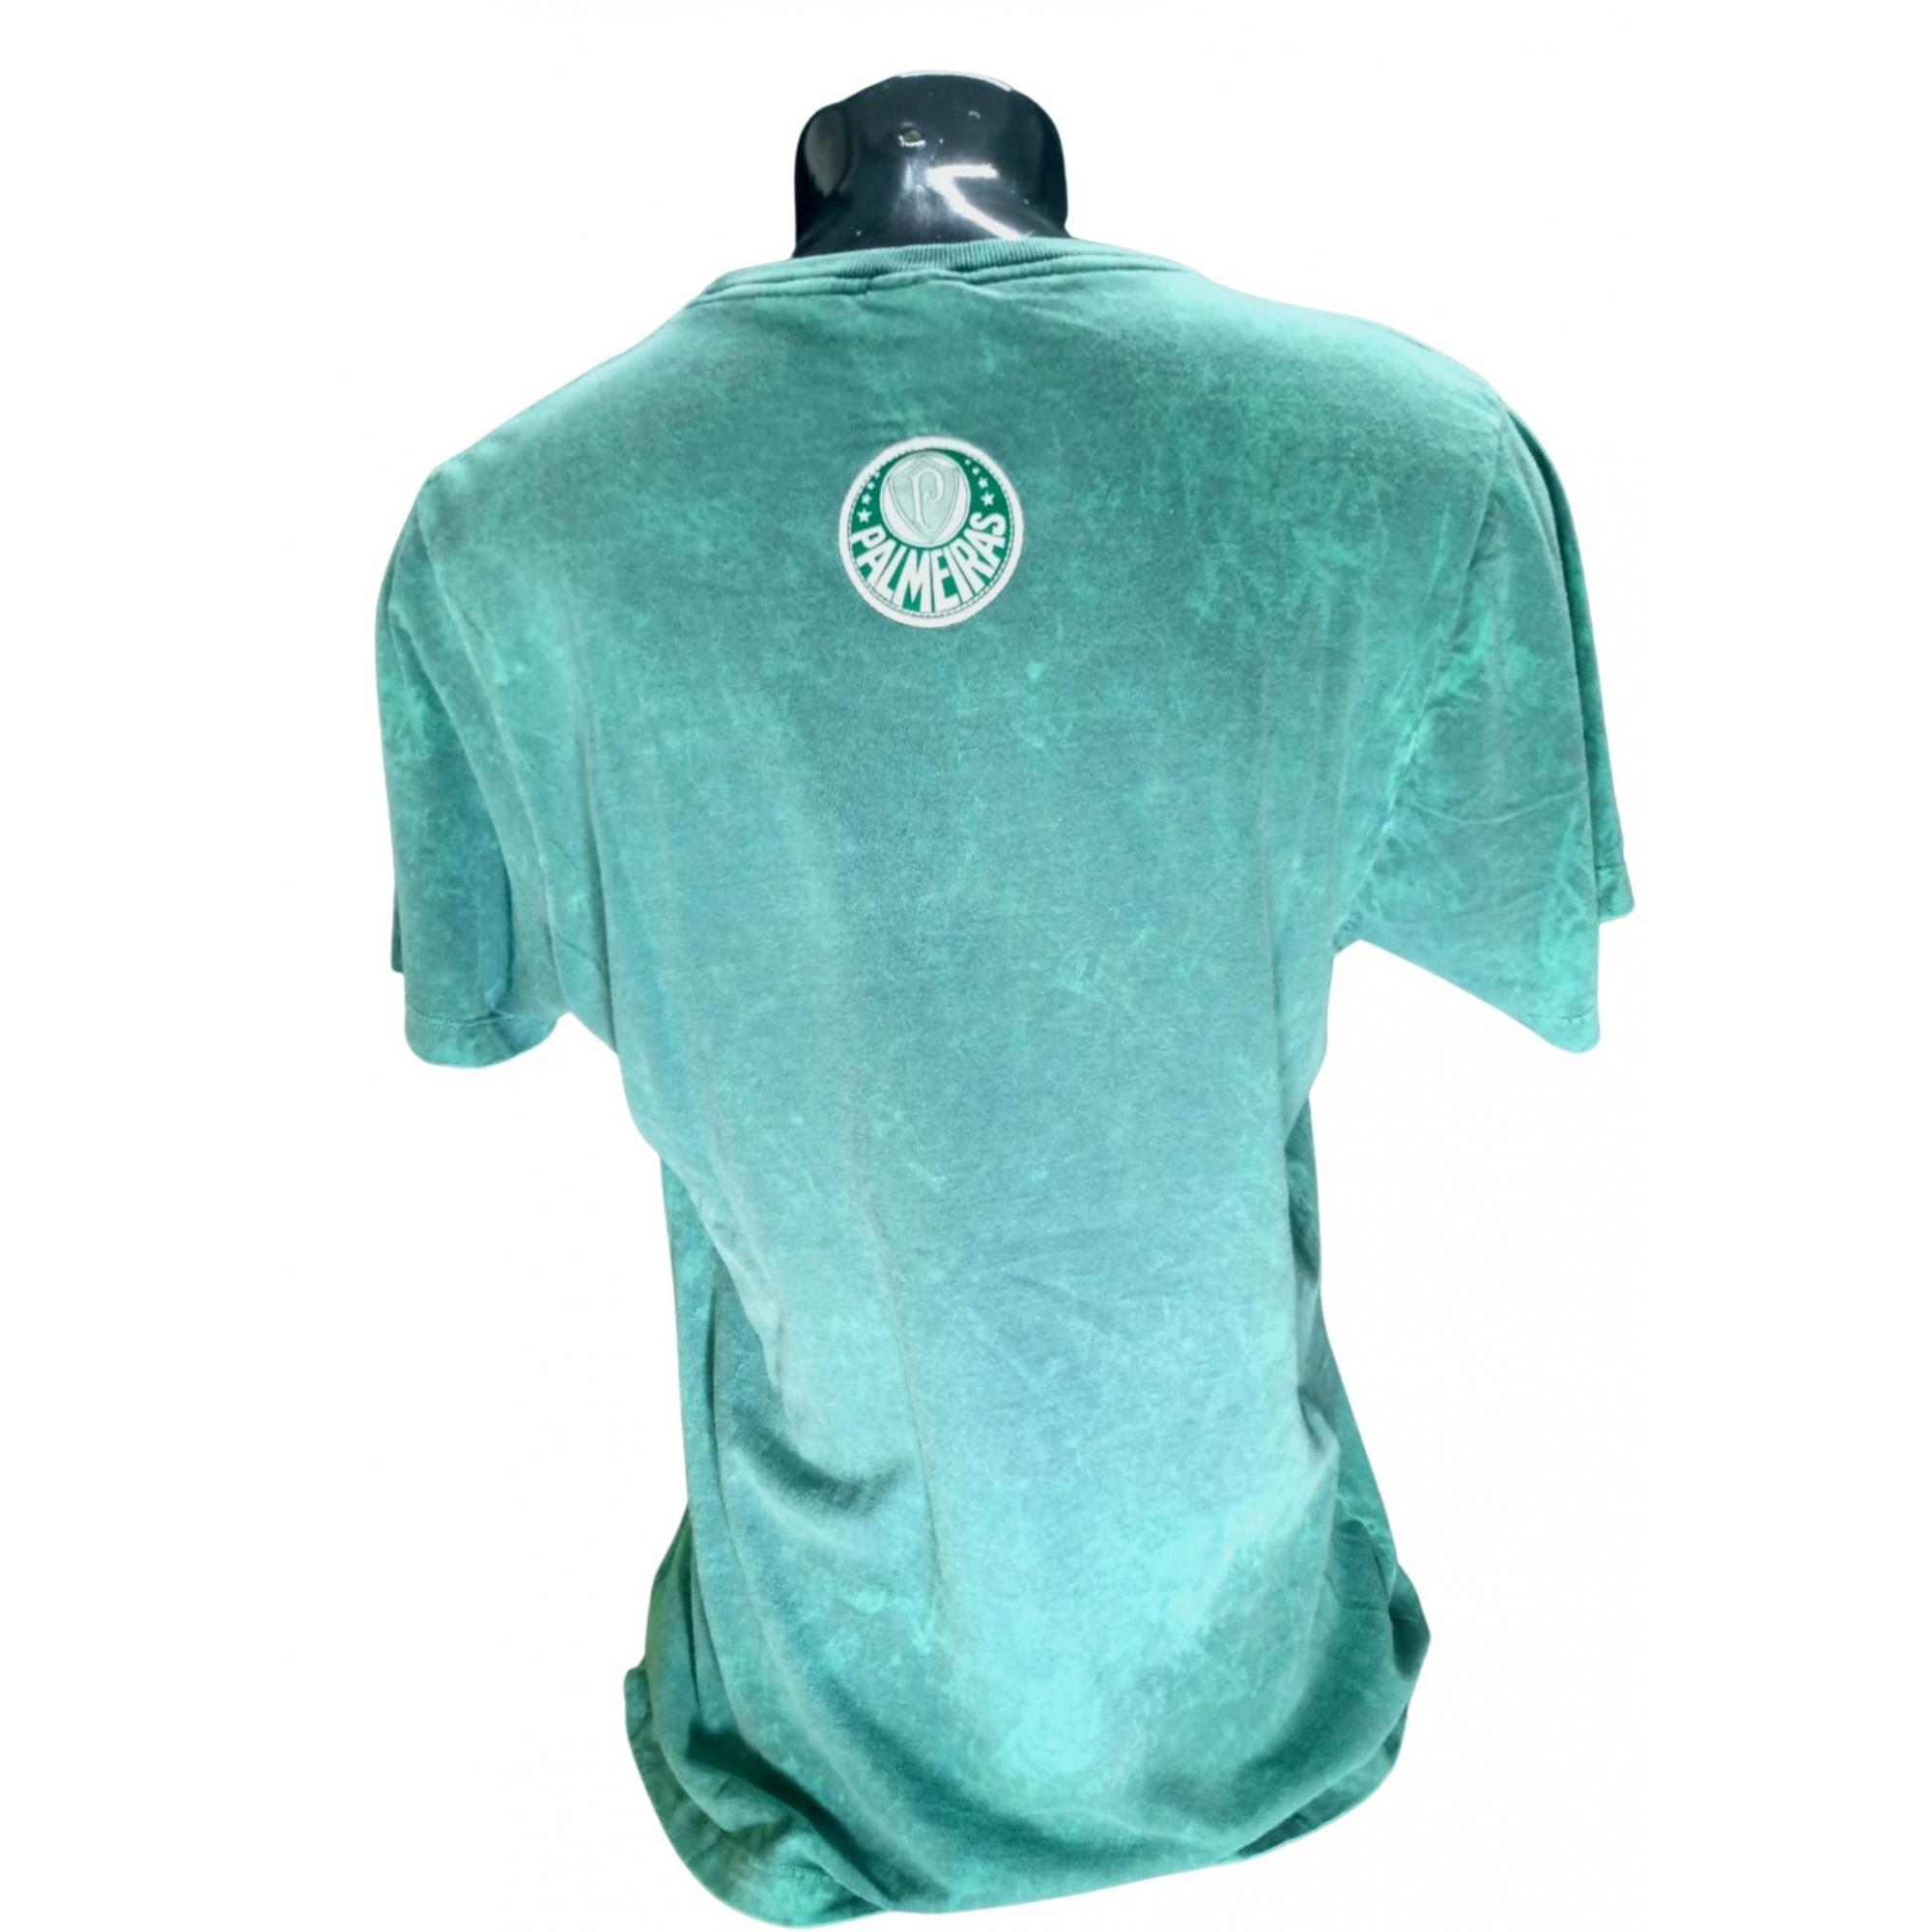 Camisa Palmeiras força palestra